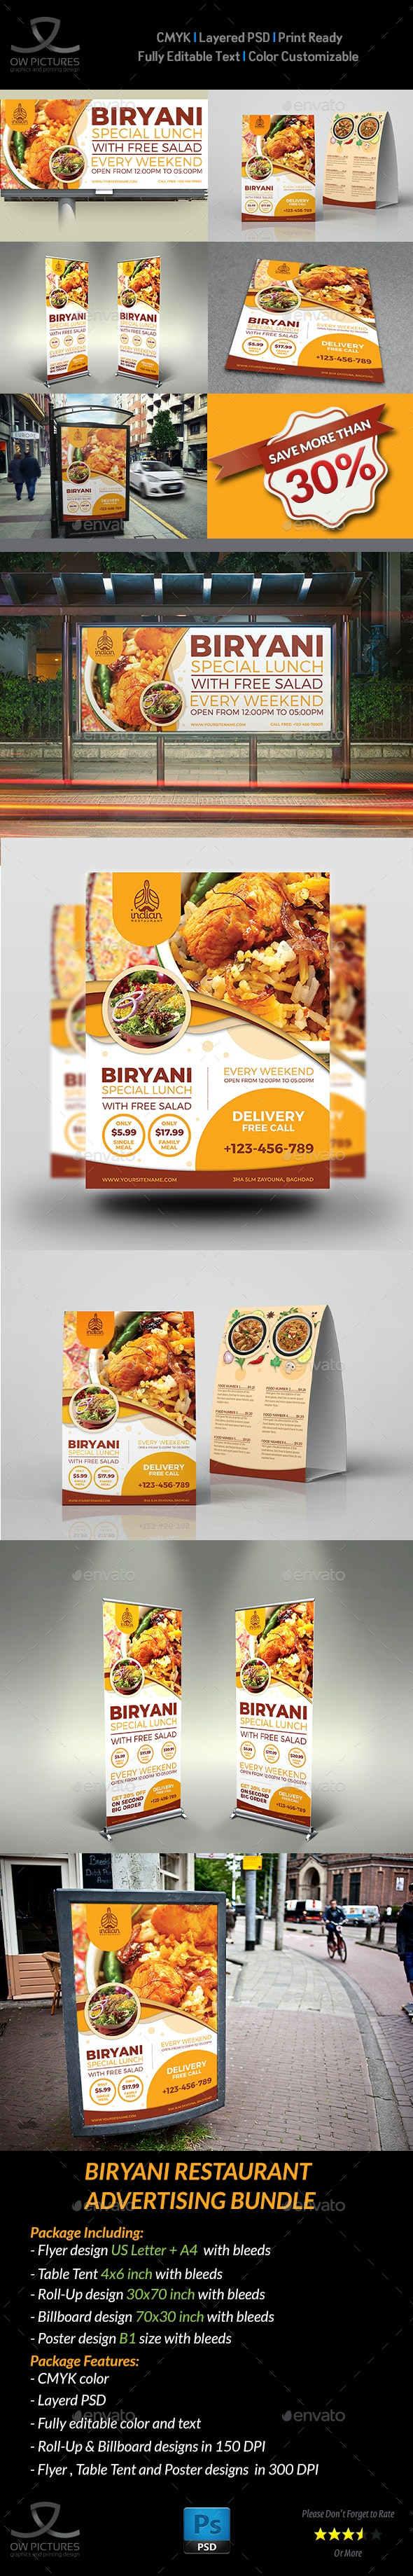 Biryani Restaurant Advertising Bundle - Signage Print Templates